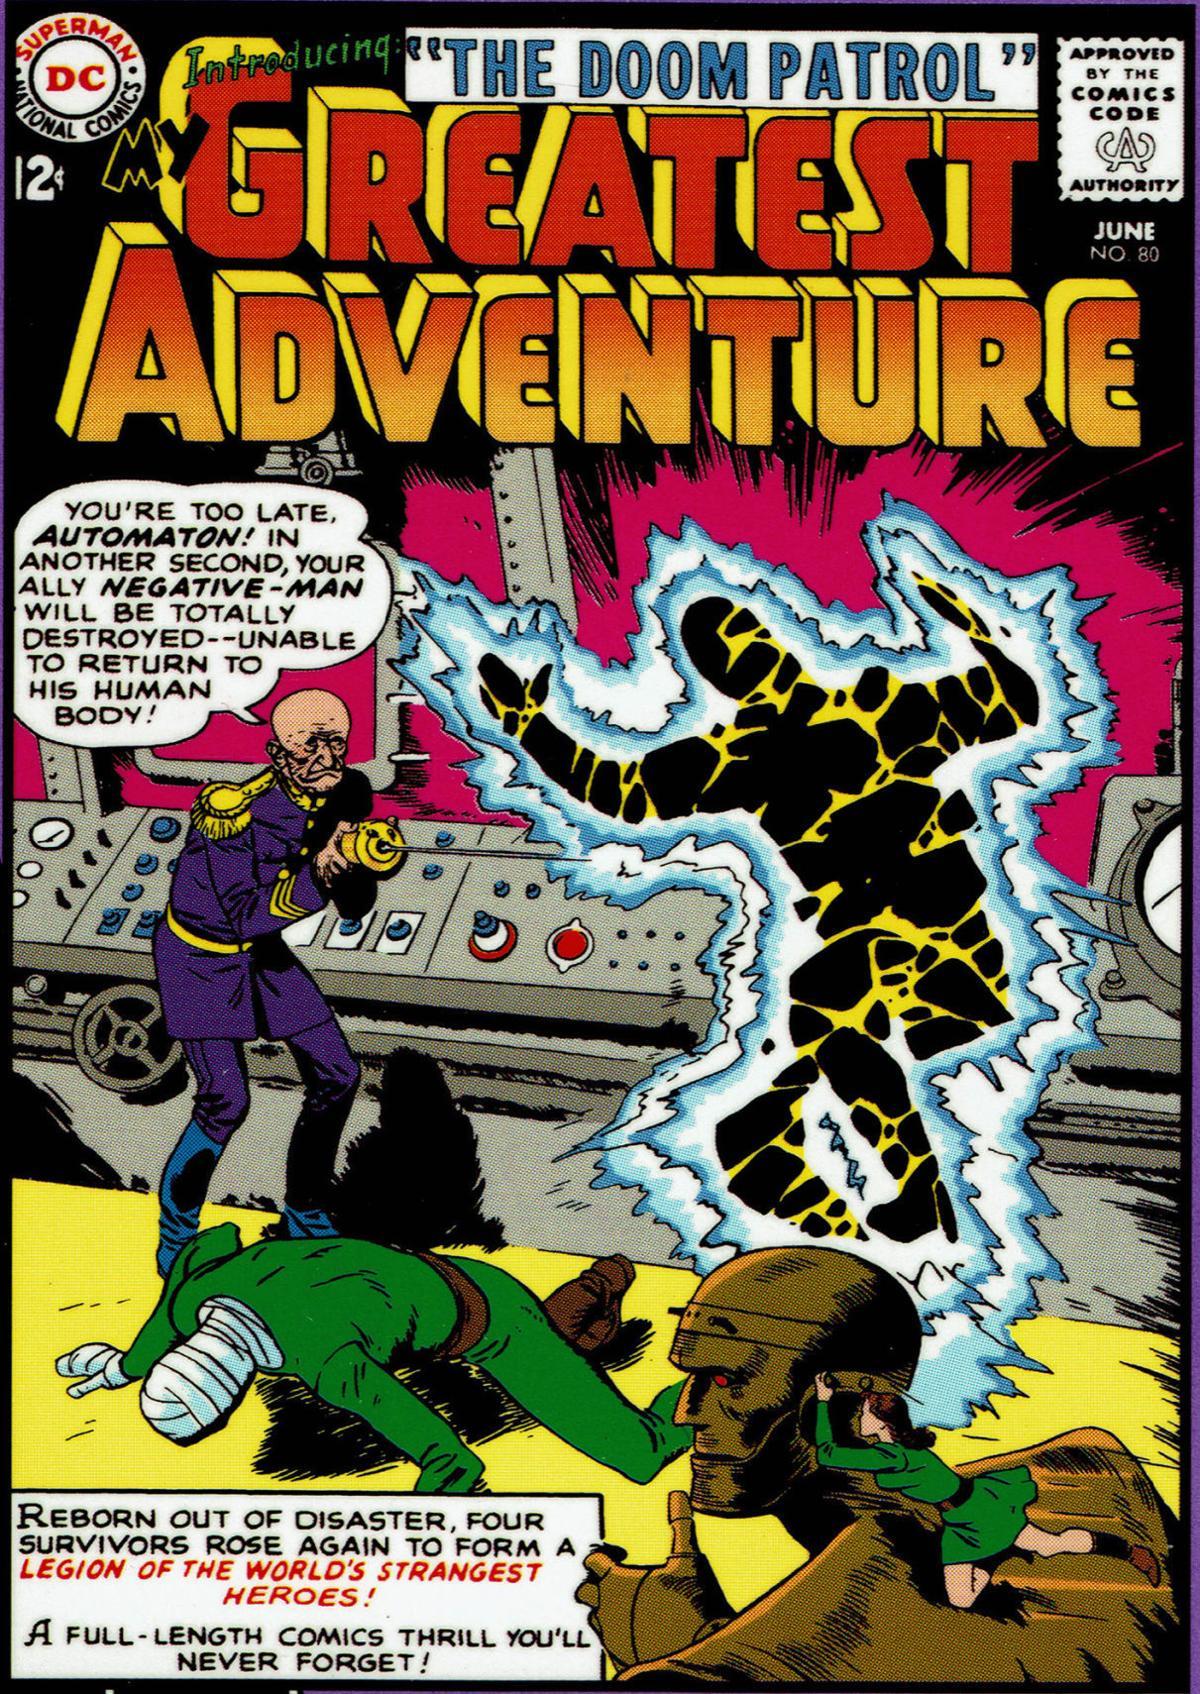 Captain Comics: Deciphering the weird 'Doom Patrol' team | The Mouth